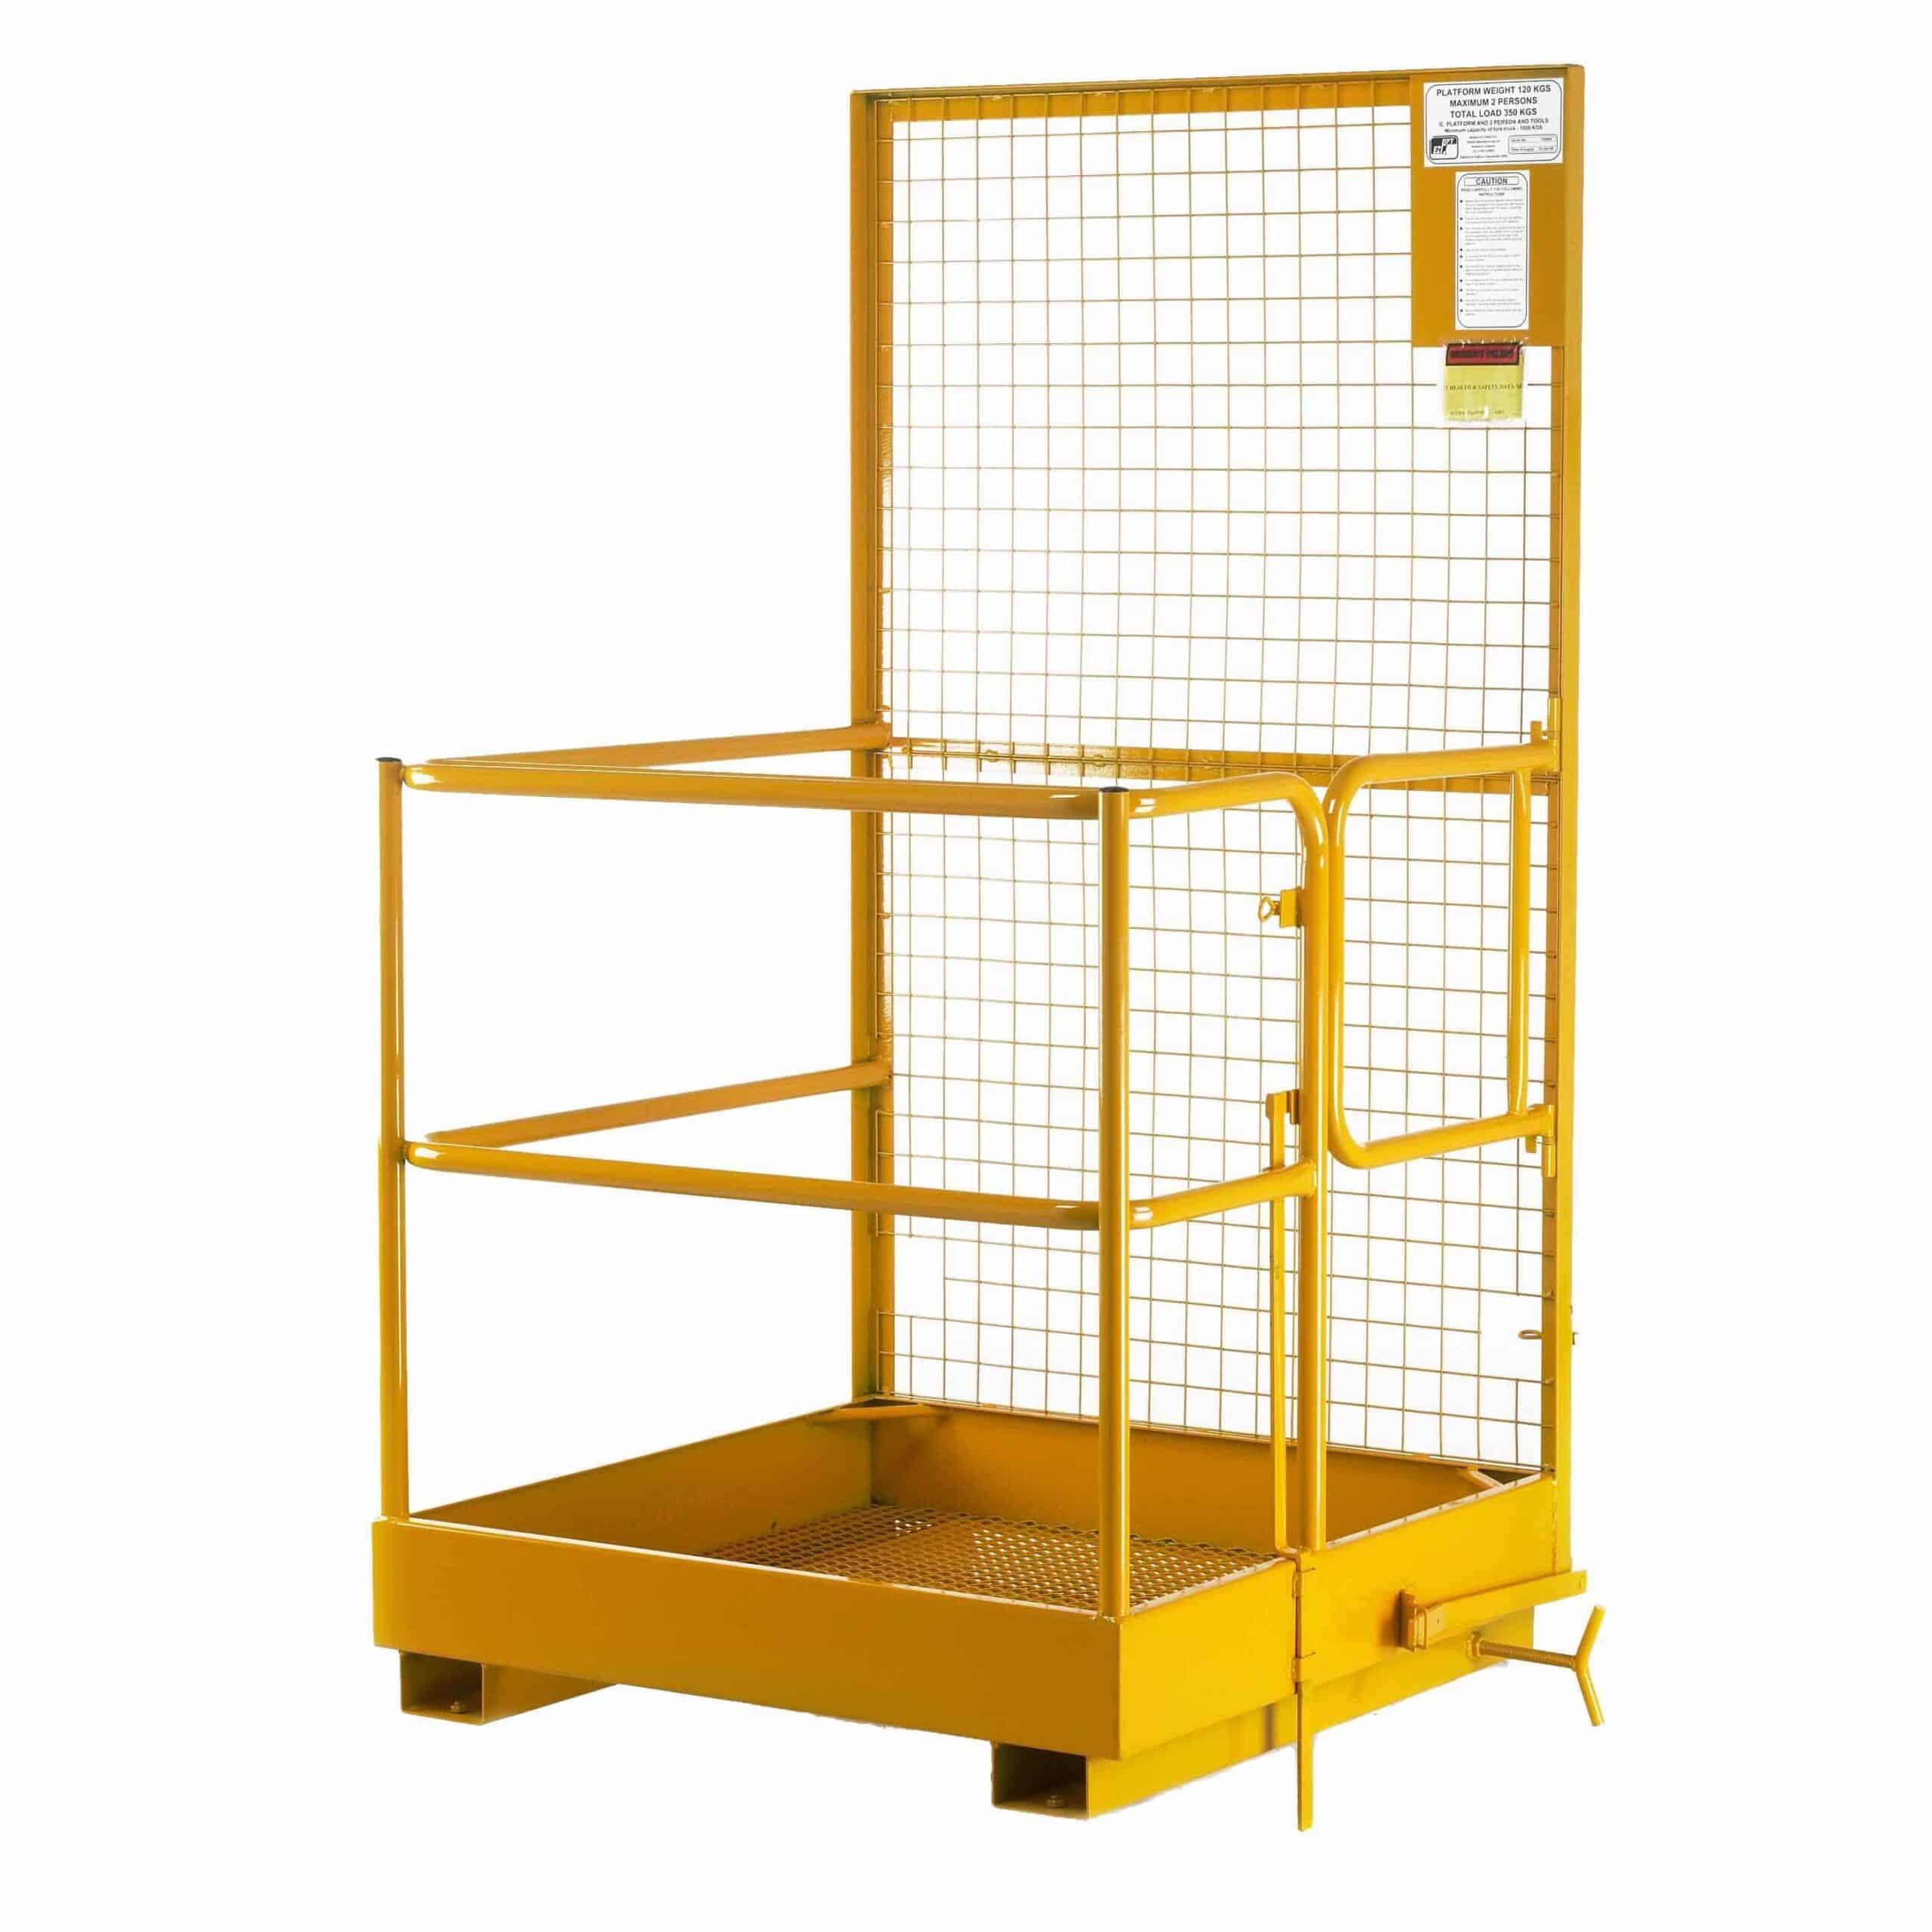 Forklift Truck Mounted Steel Access Platform